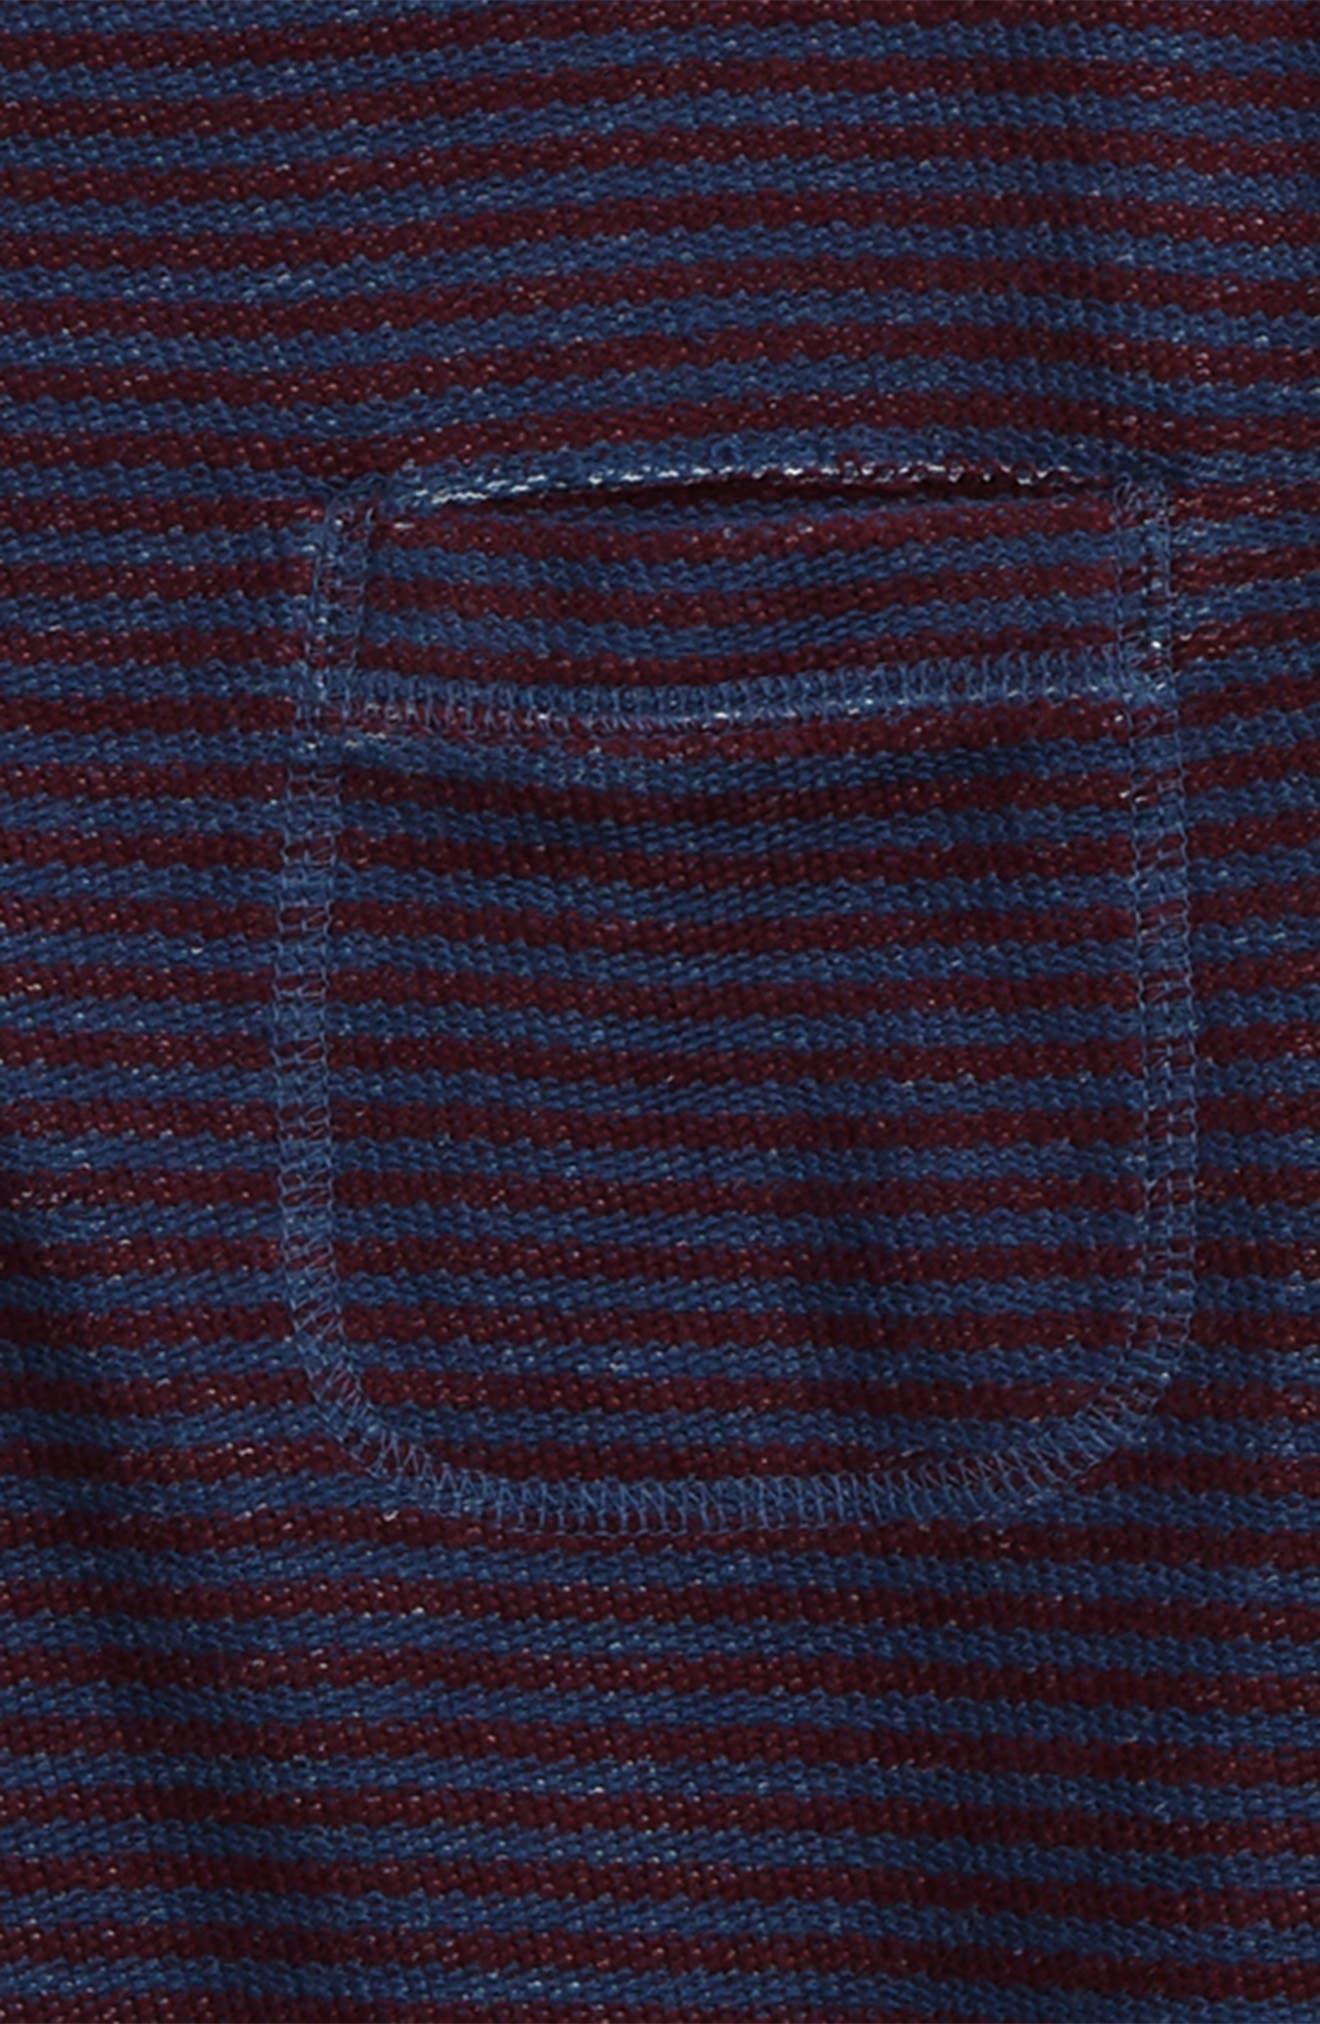 Stripe Crewneck Sweatshirt,                             Alternate thumbnail 2, color,                             410